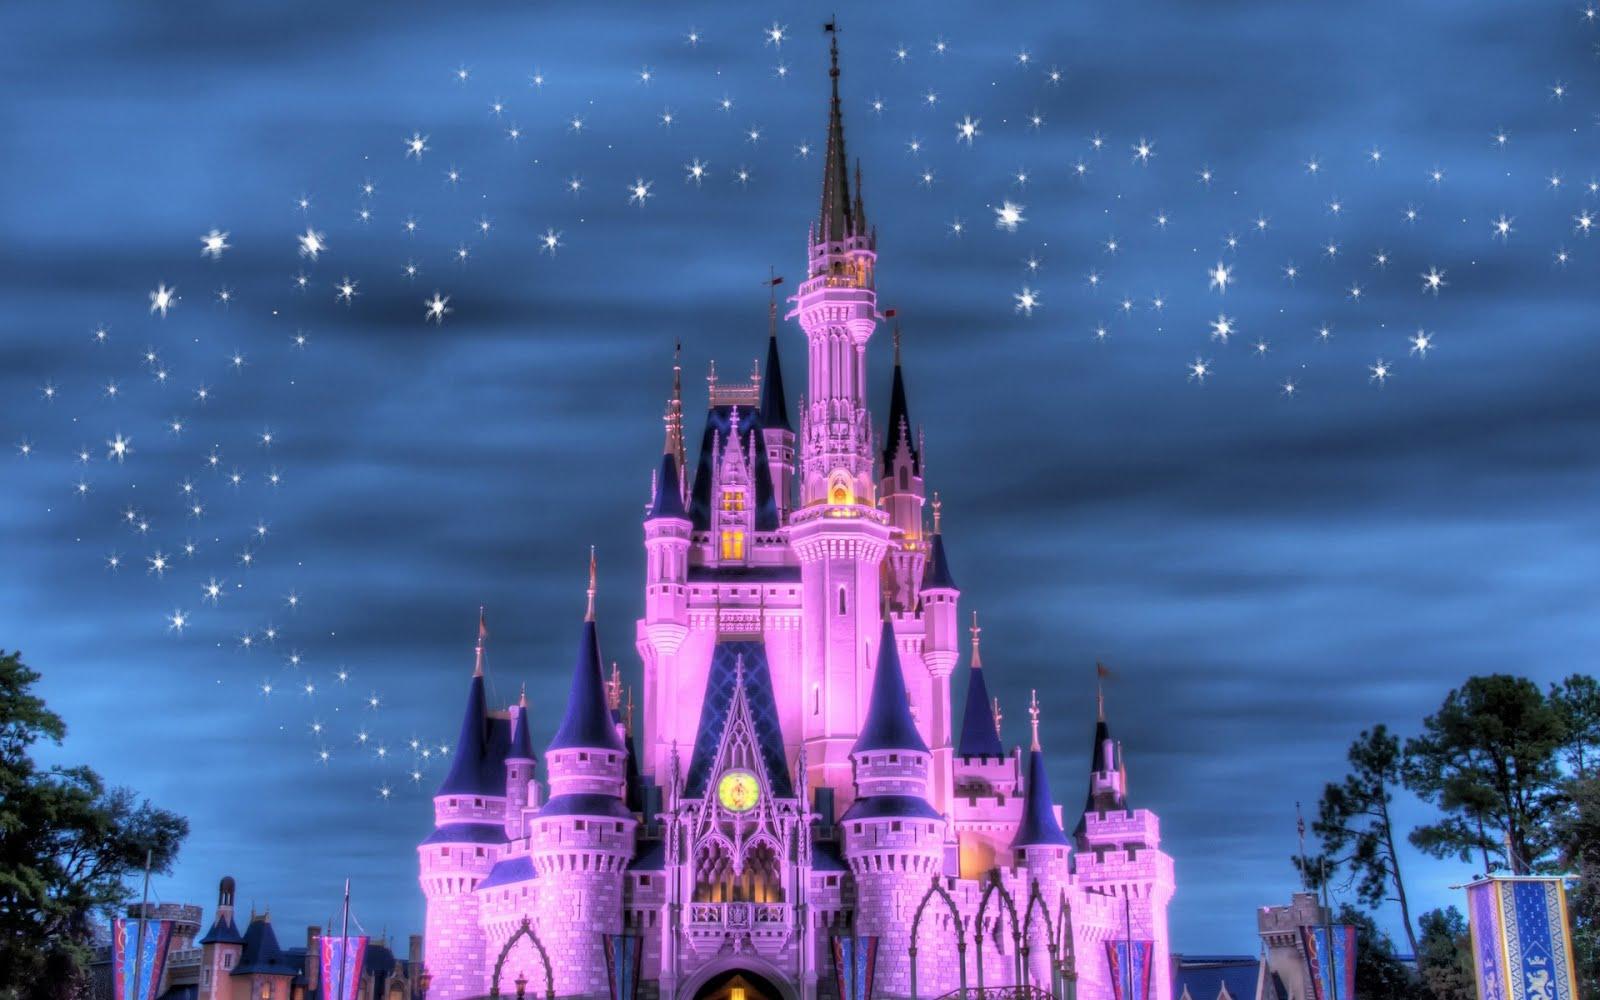 Iphone Wallpaper Disney World